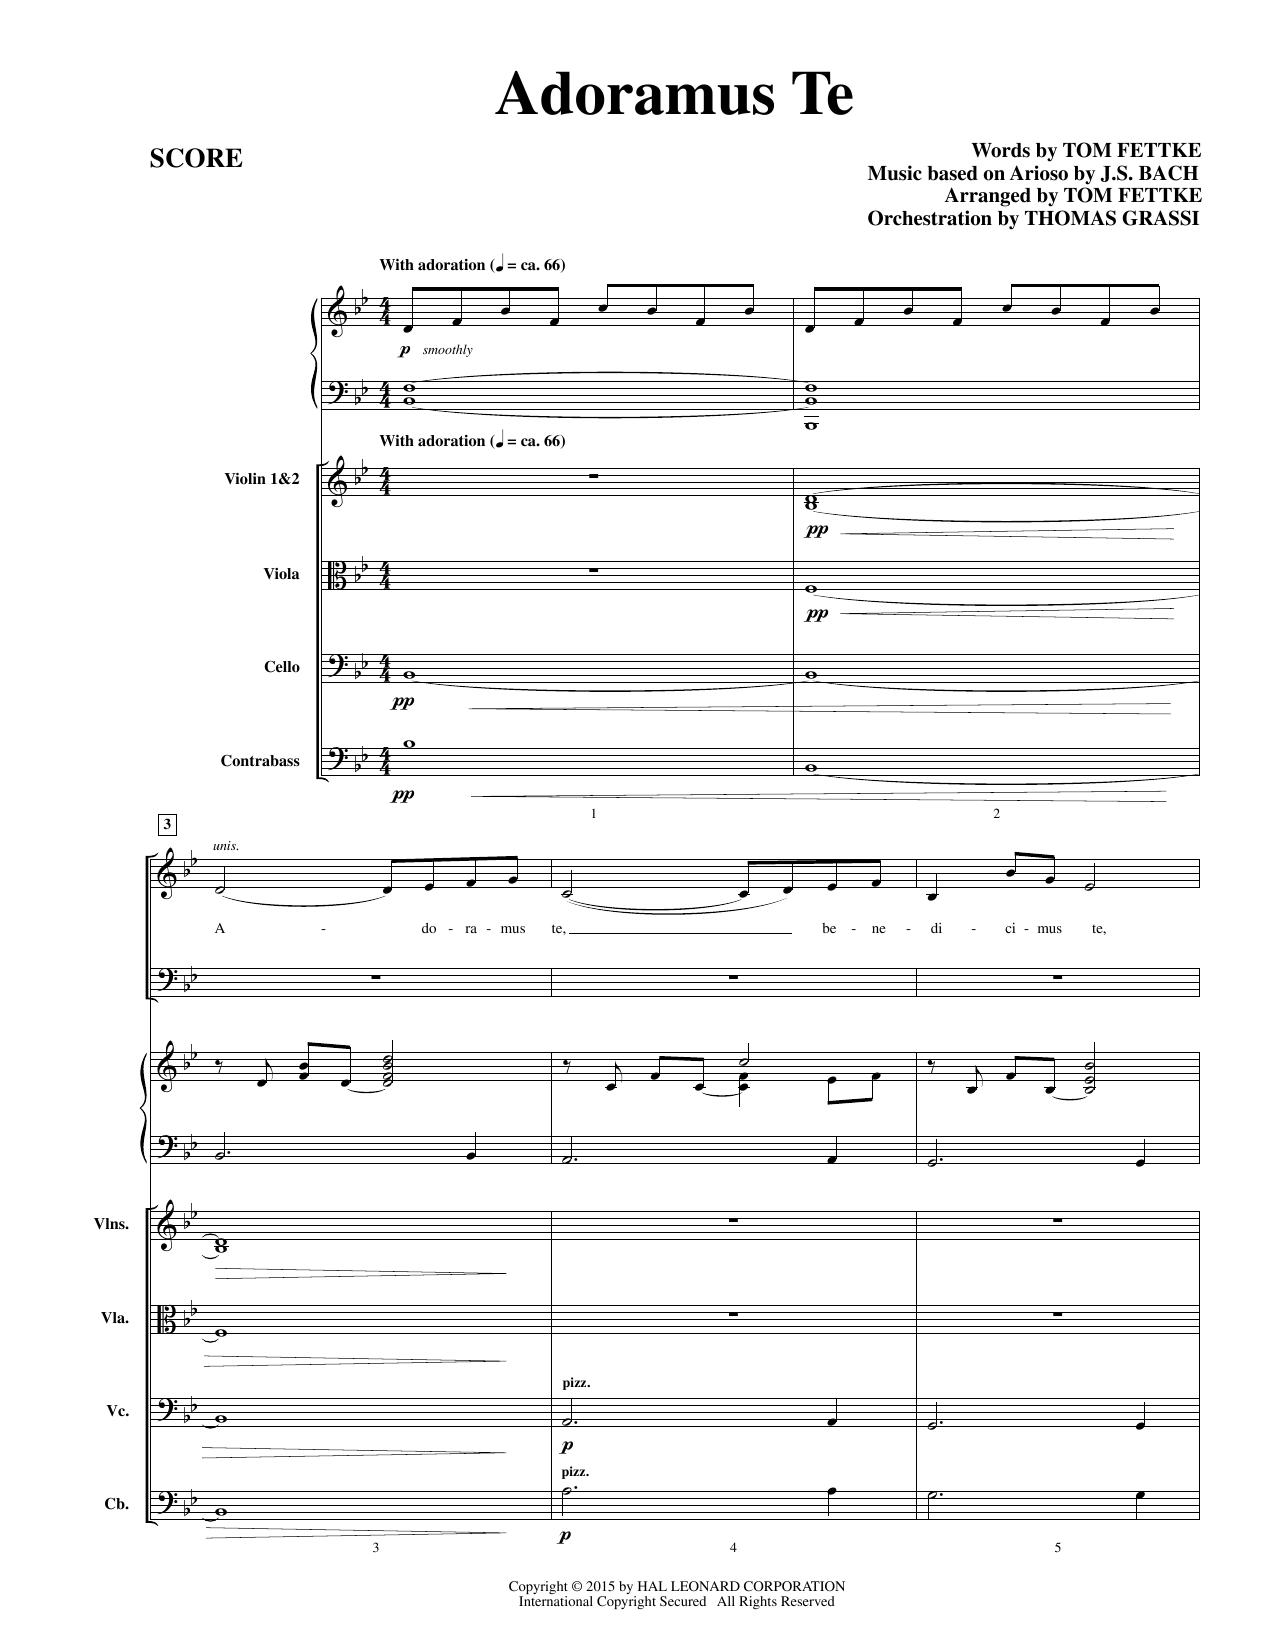 Tom Fettke Adoramus Te - Conductor Score (Full Score) sheet music notes and chords. Download Printable PDF.